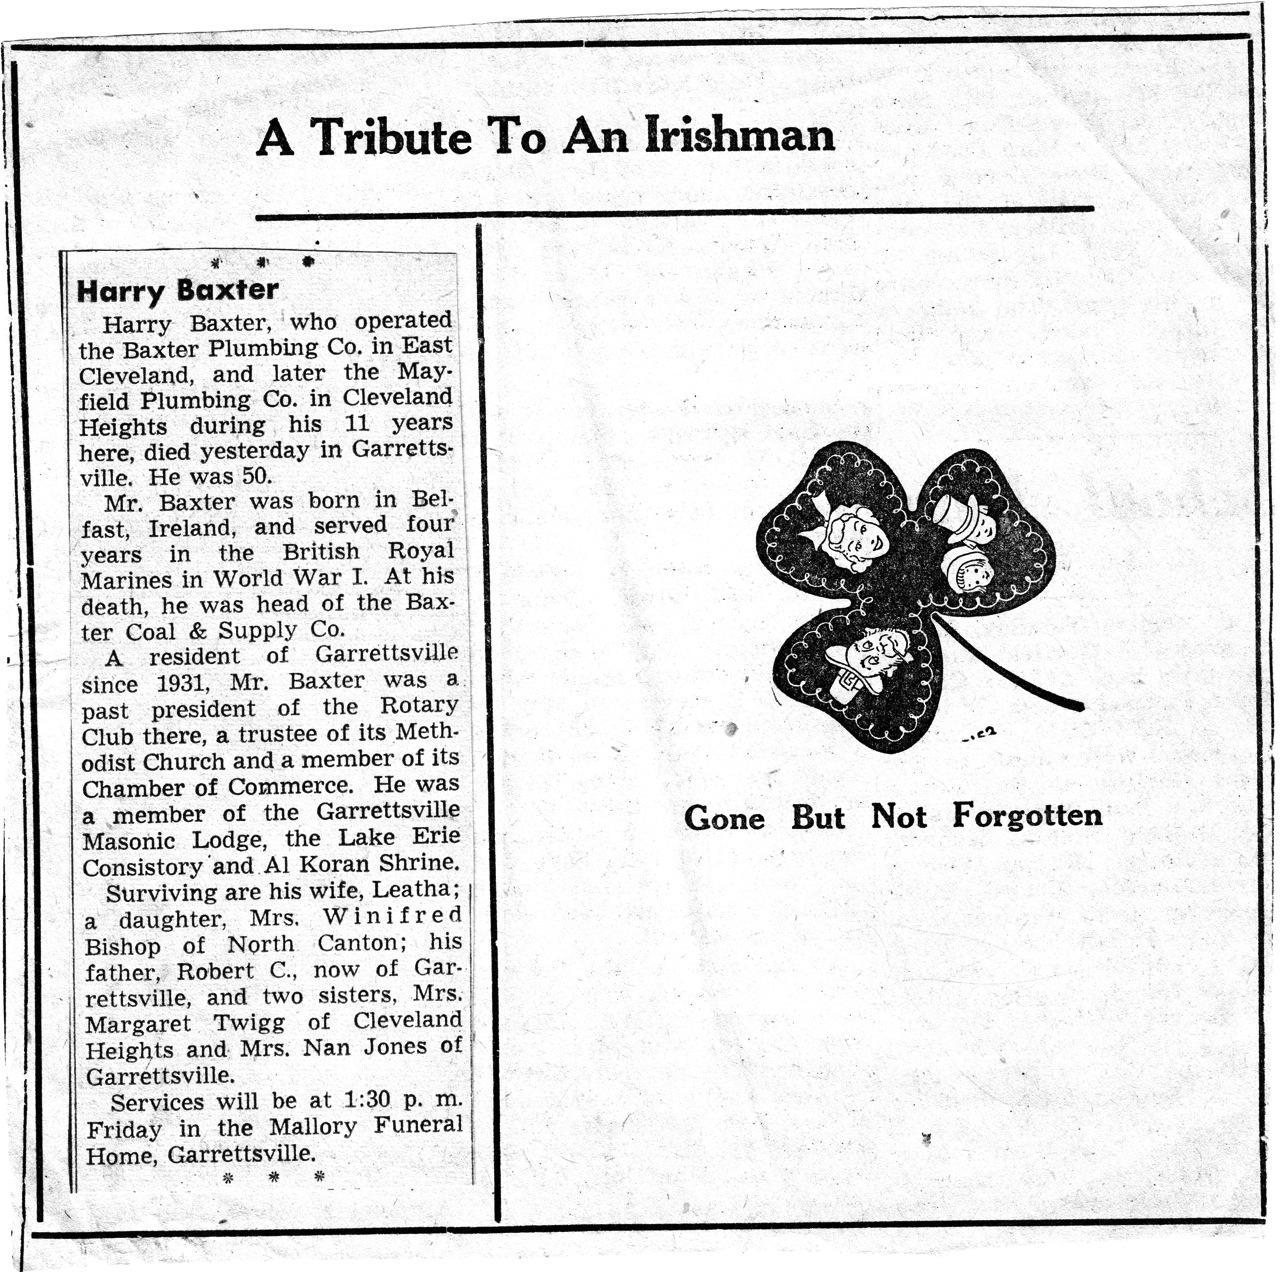 A Sense of Family: Tribute to an Irishman: Harry Baxter